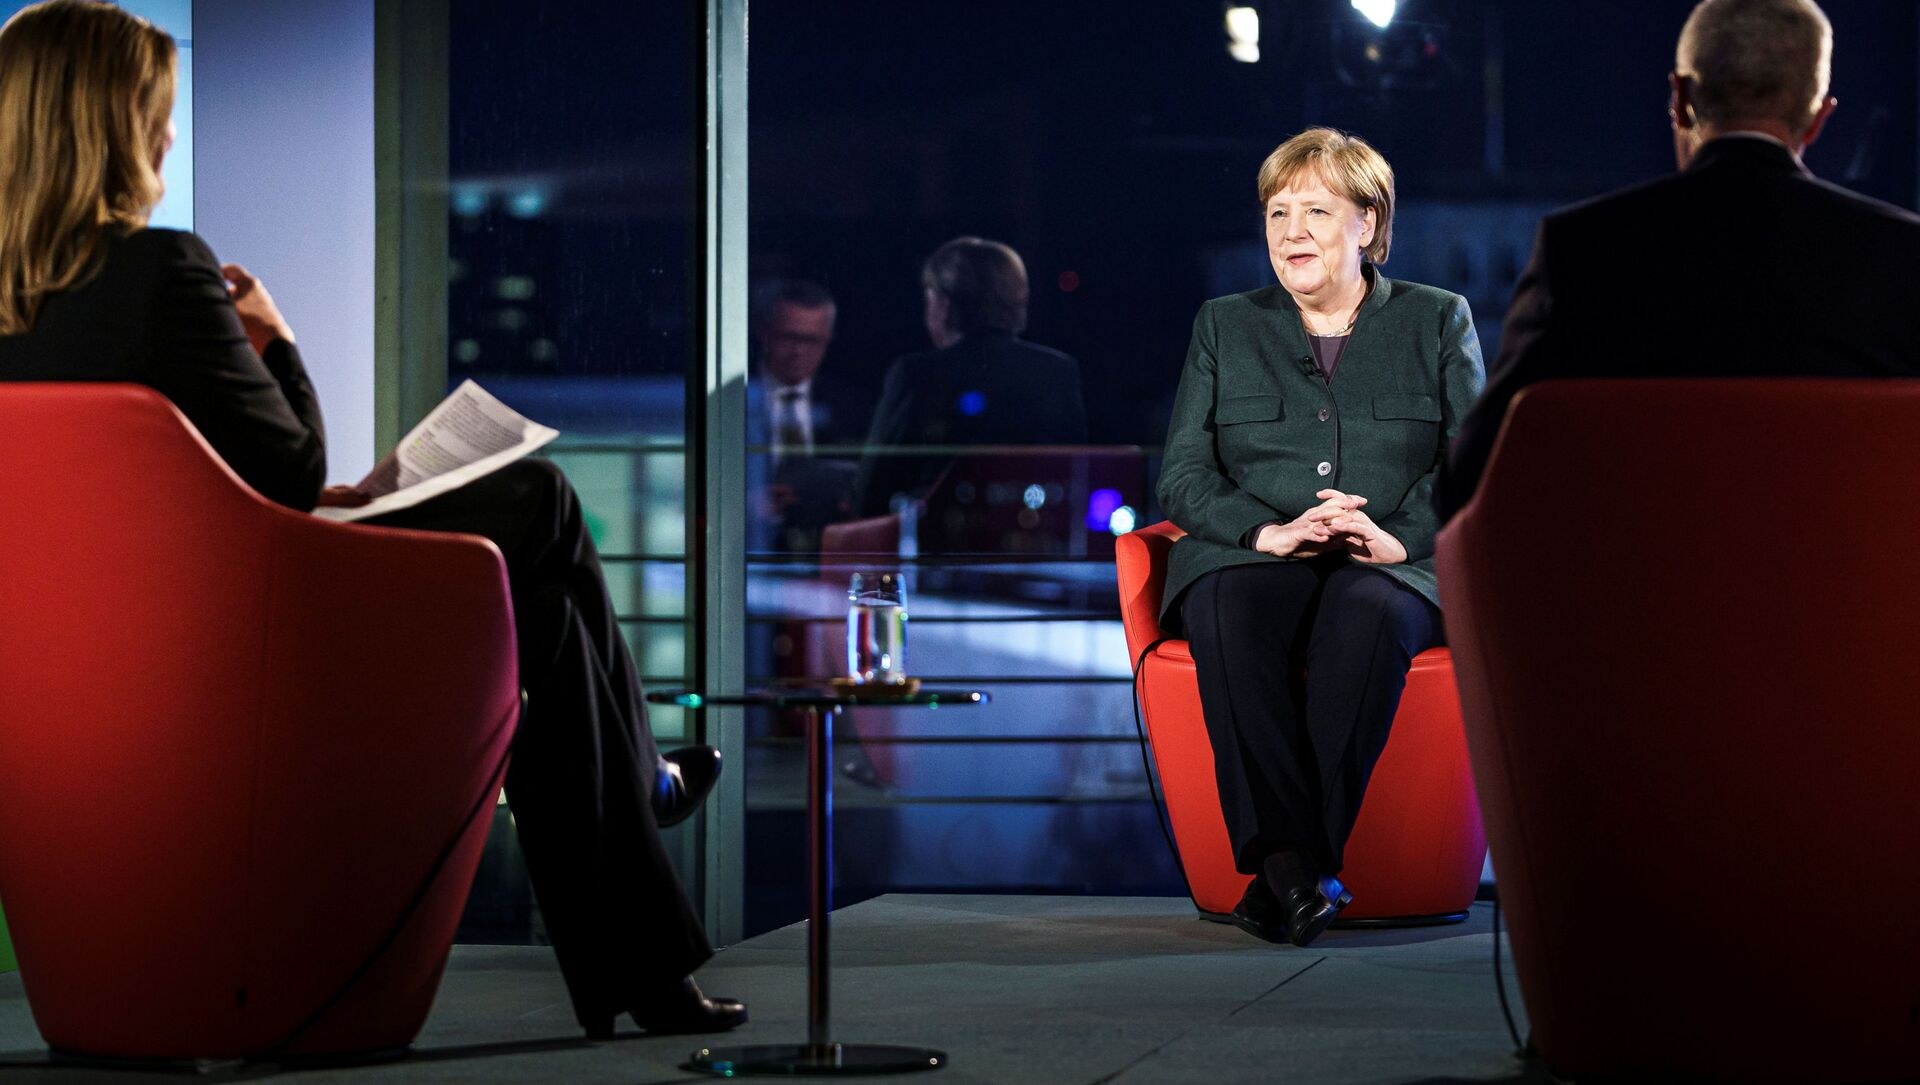 Angela Merkel, canciller alemana - Sputnik Mundo, 1920, 02.02.2021